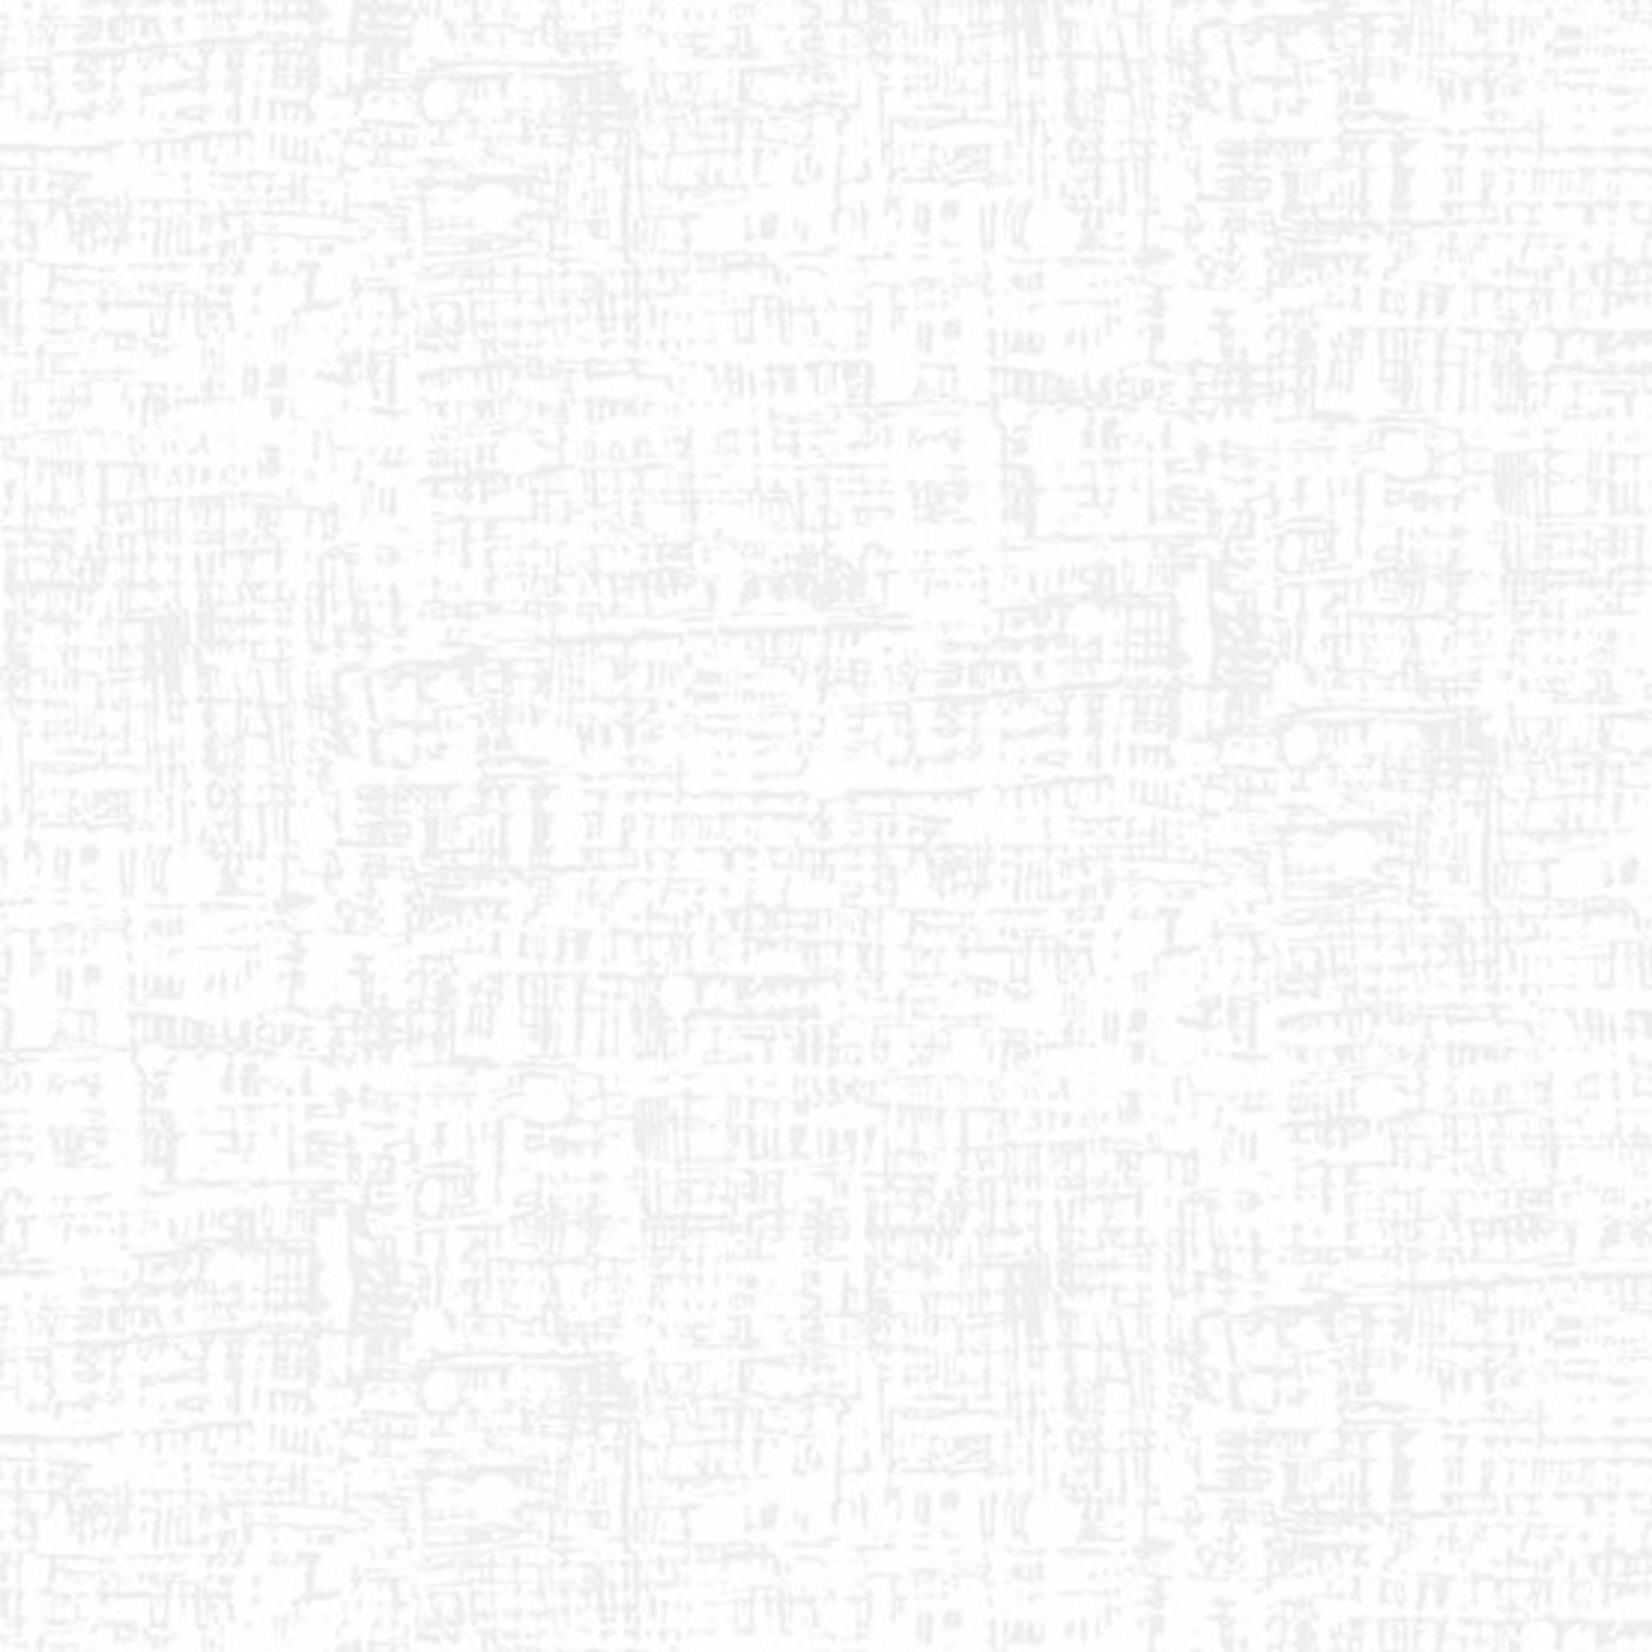 ANDOVER Century Whites, Weave Texture CS-9691-WW $0.18 per cm or $18/m